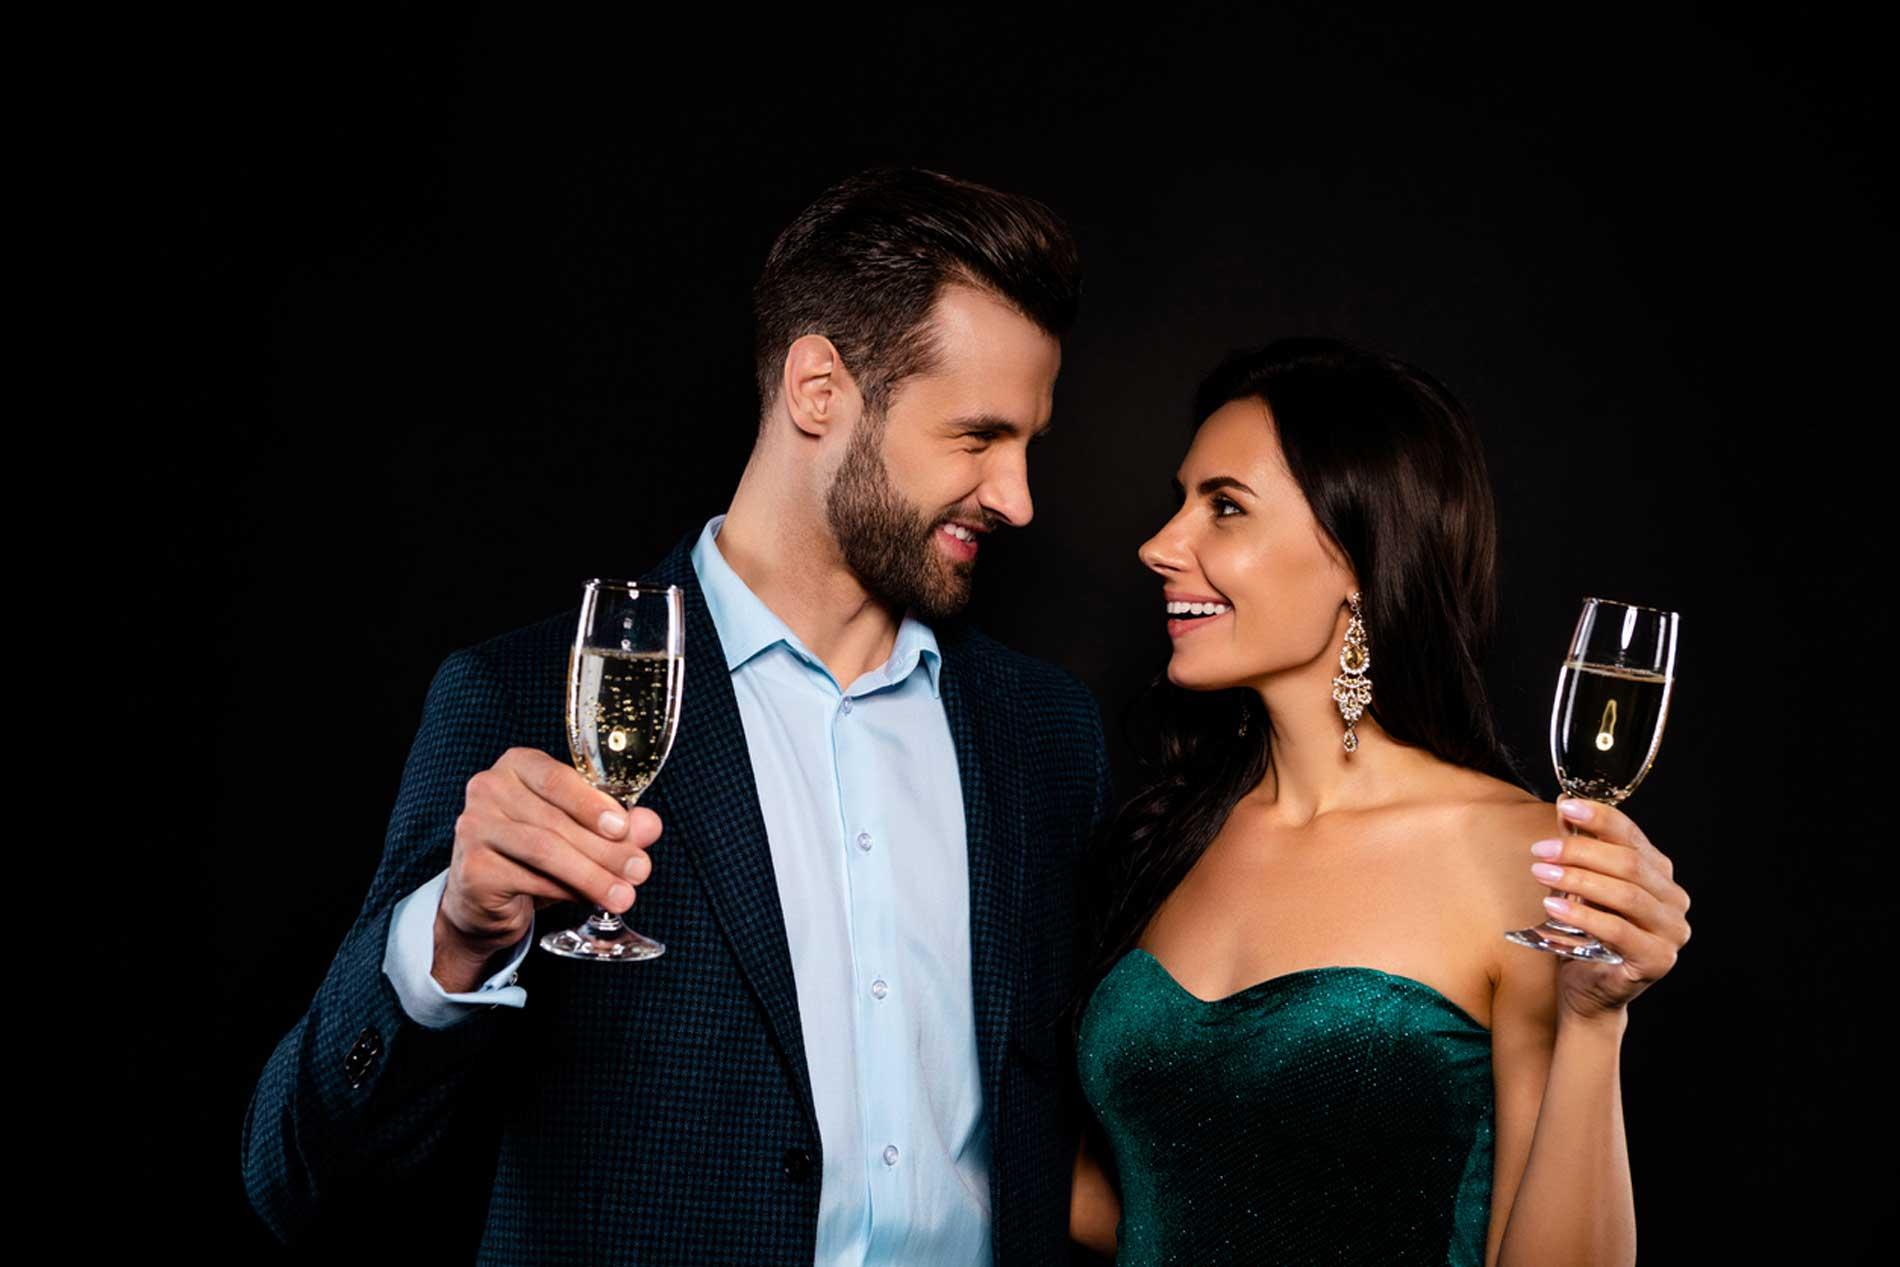 happy couple in evening wear